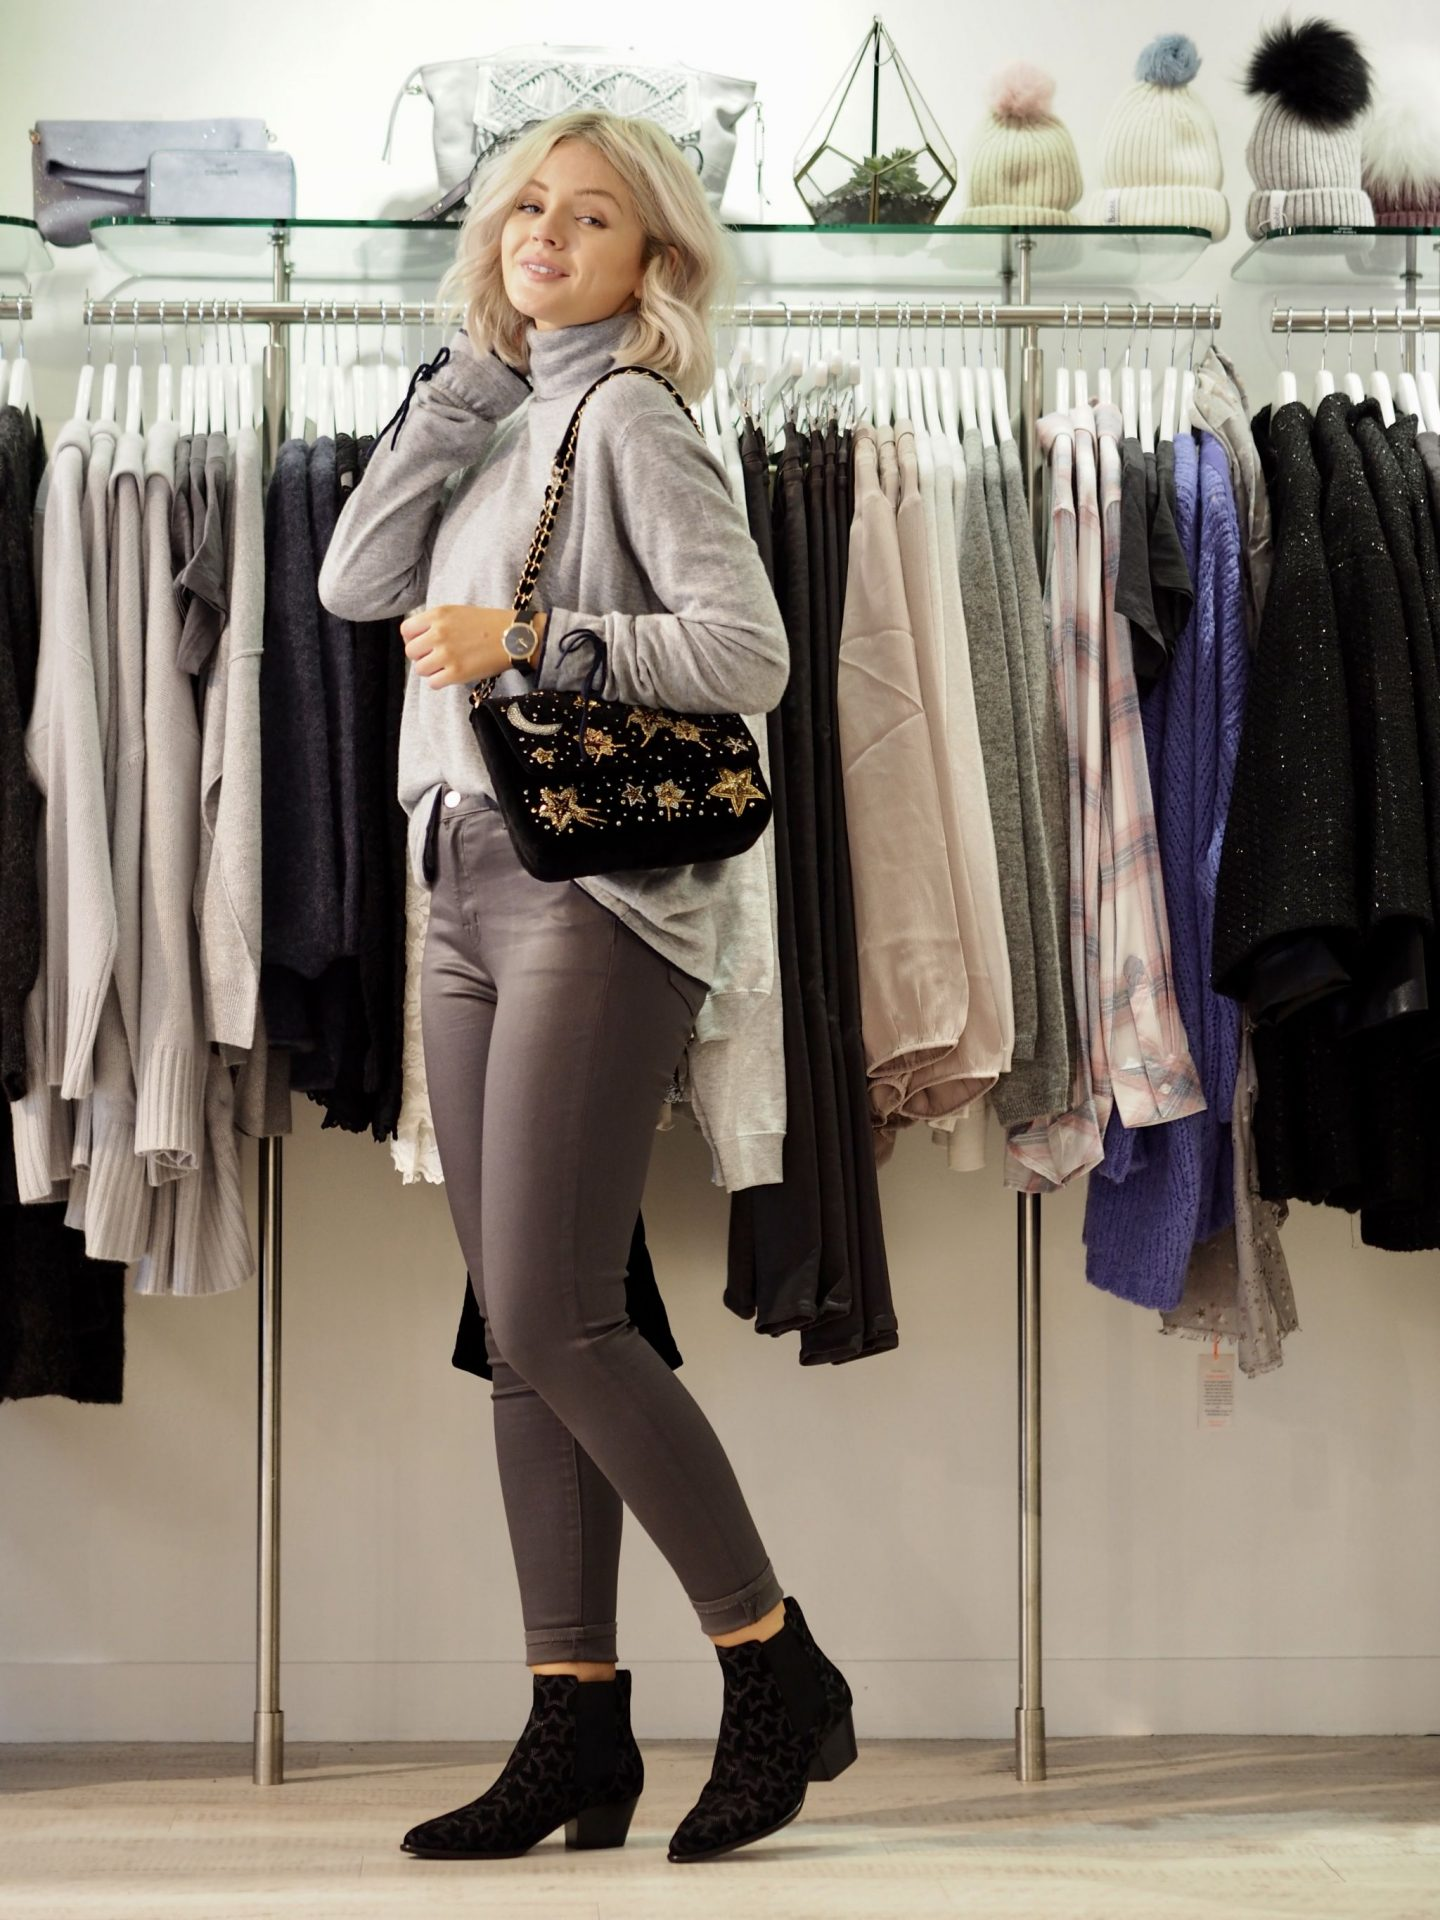 Laura Byrnes, lauras little locket, the dressing room